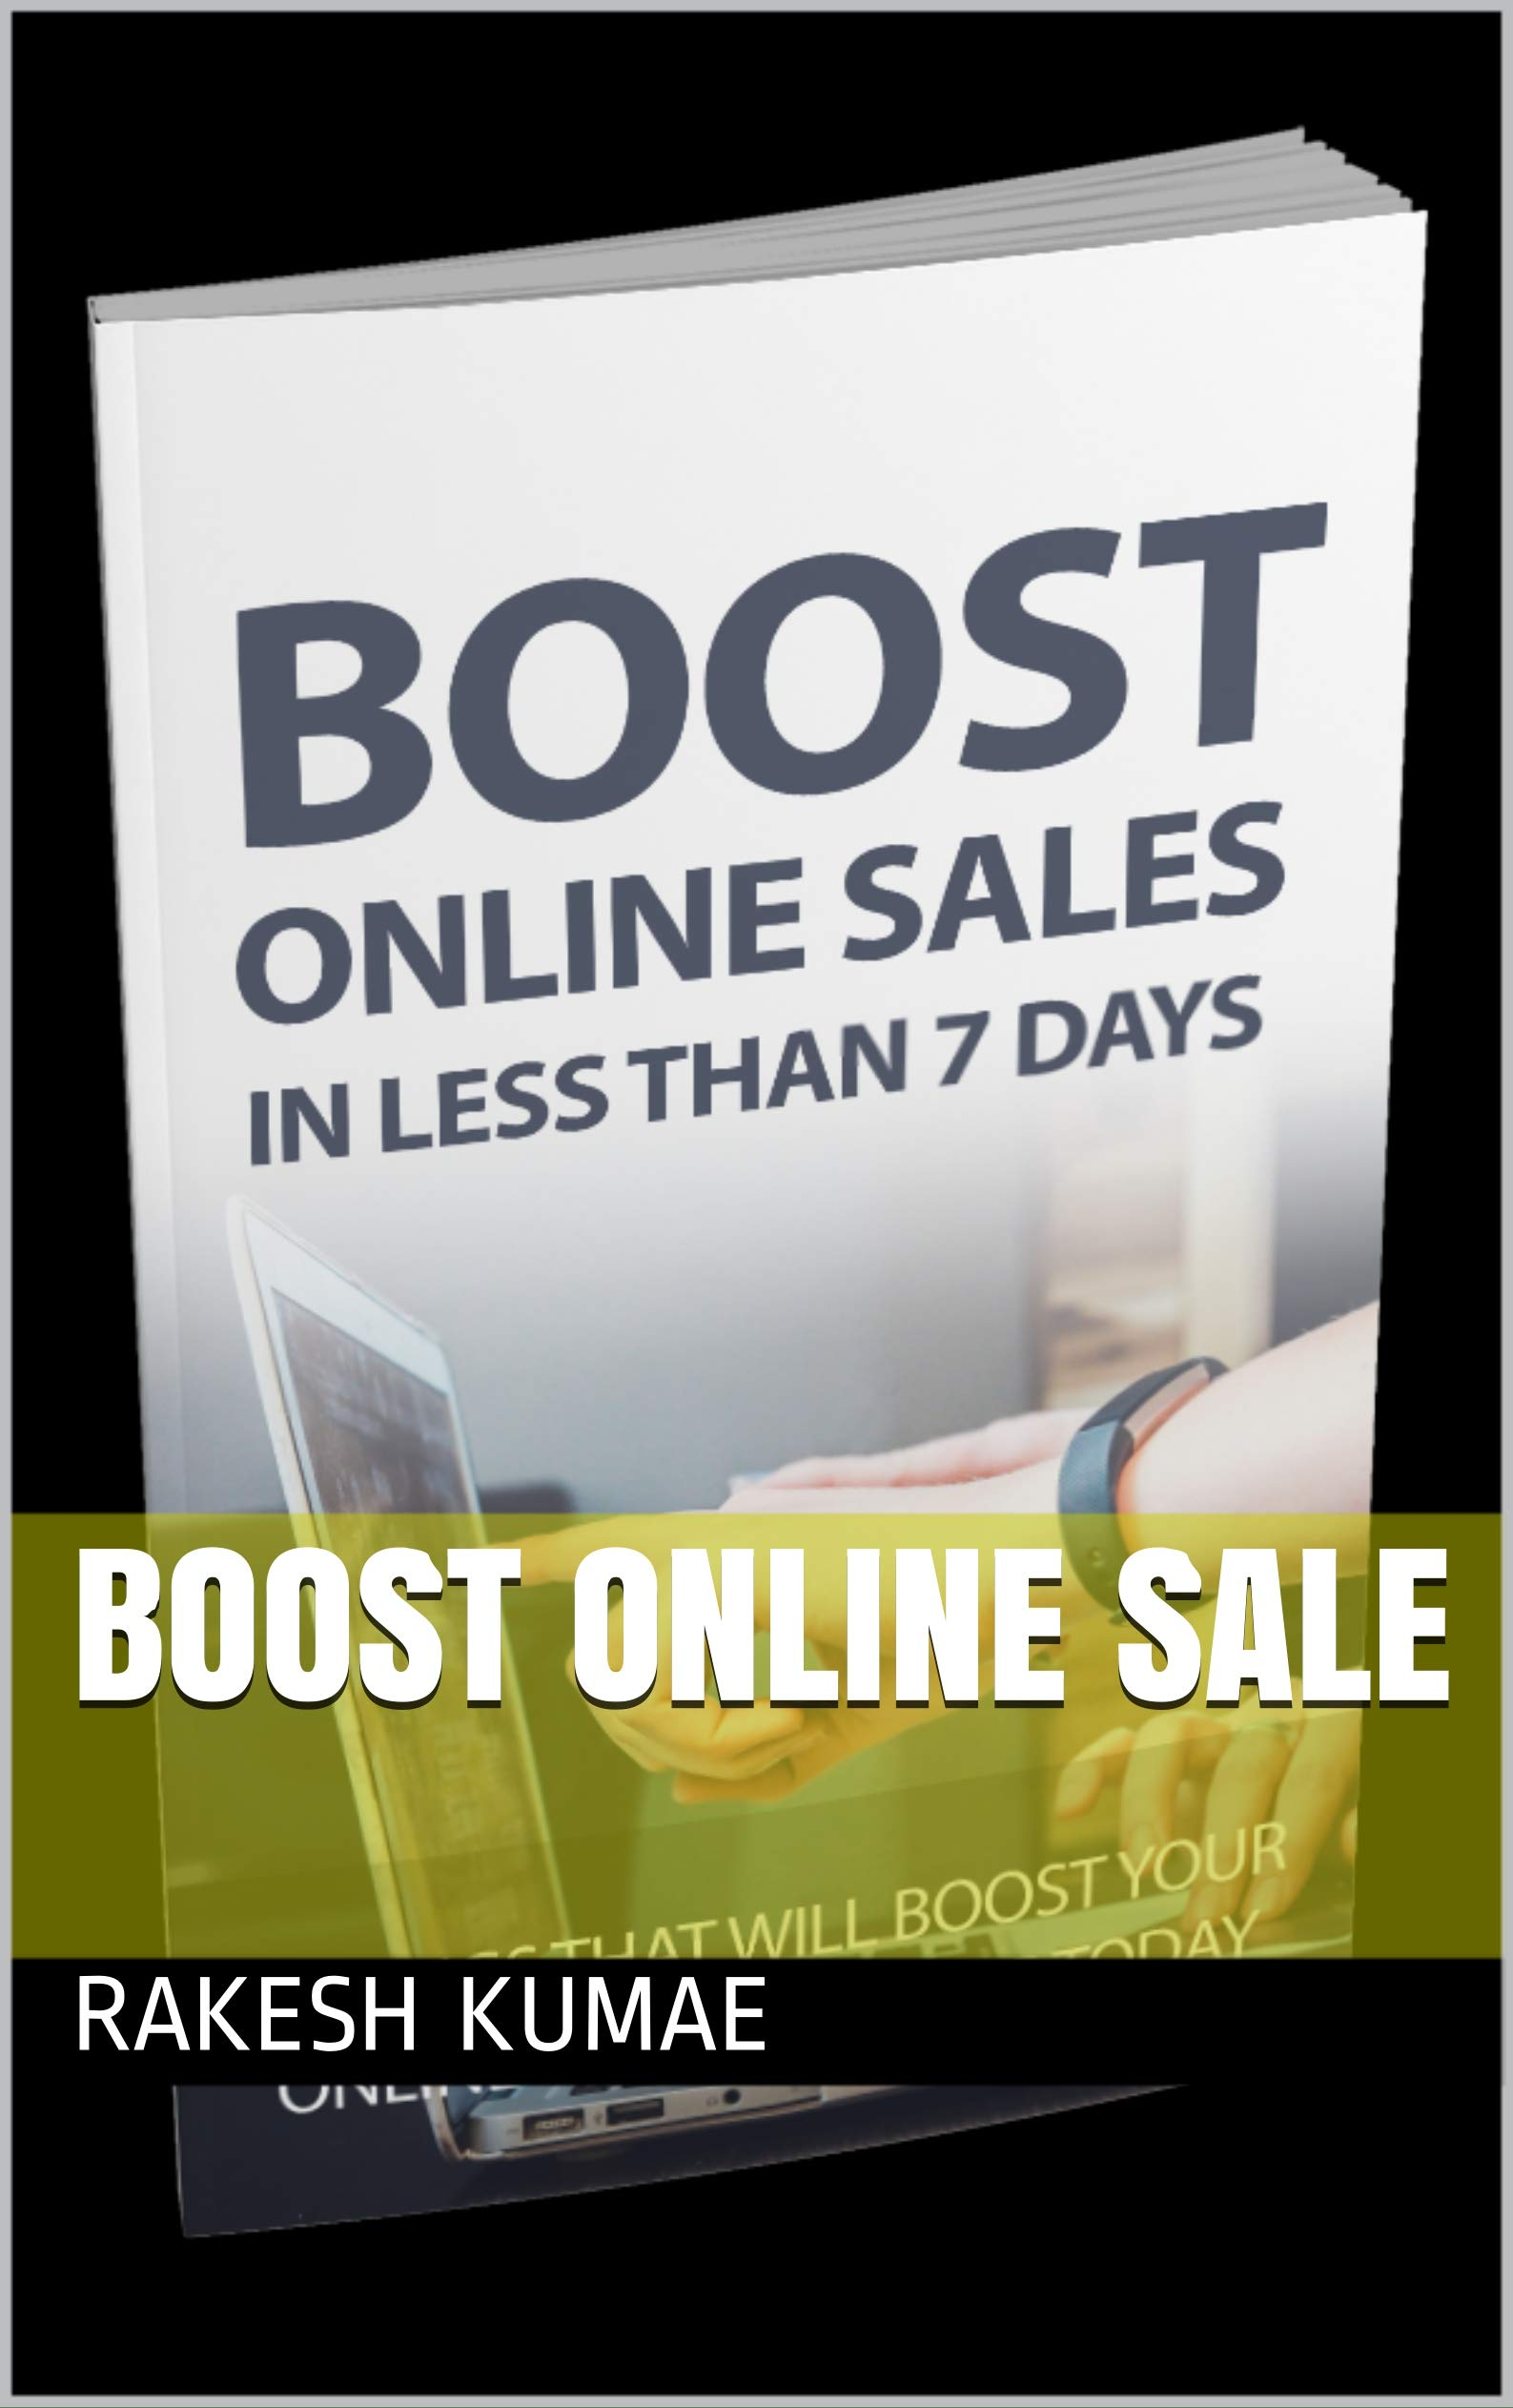 Boost Online sale